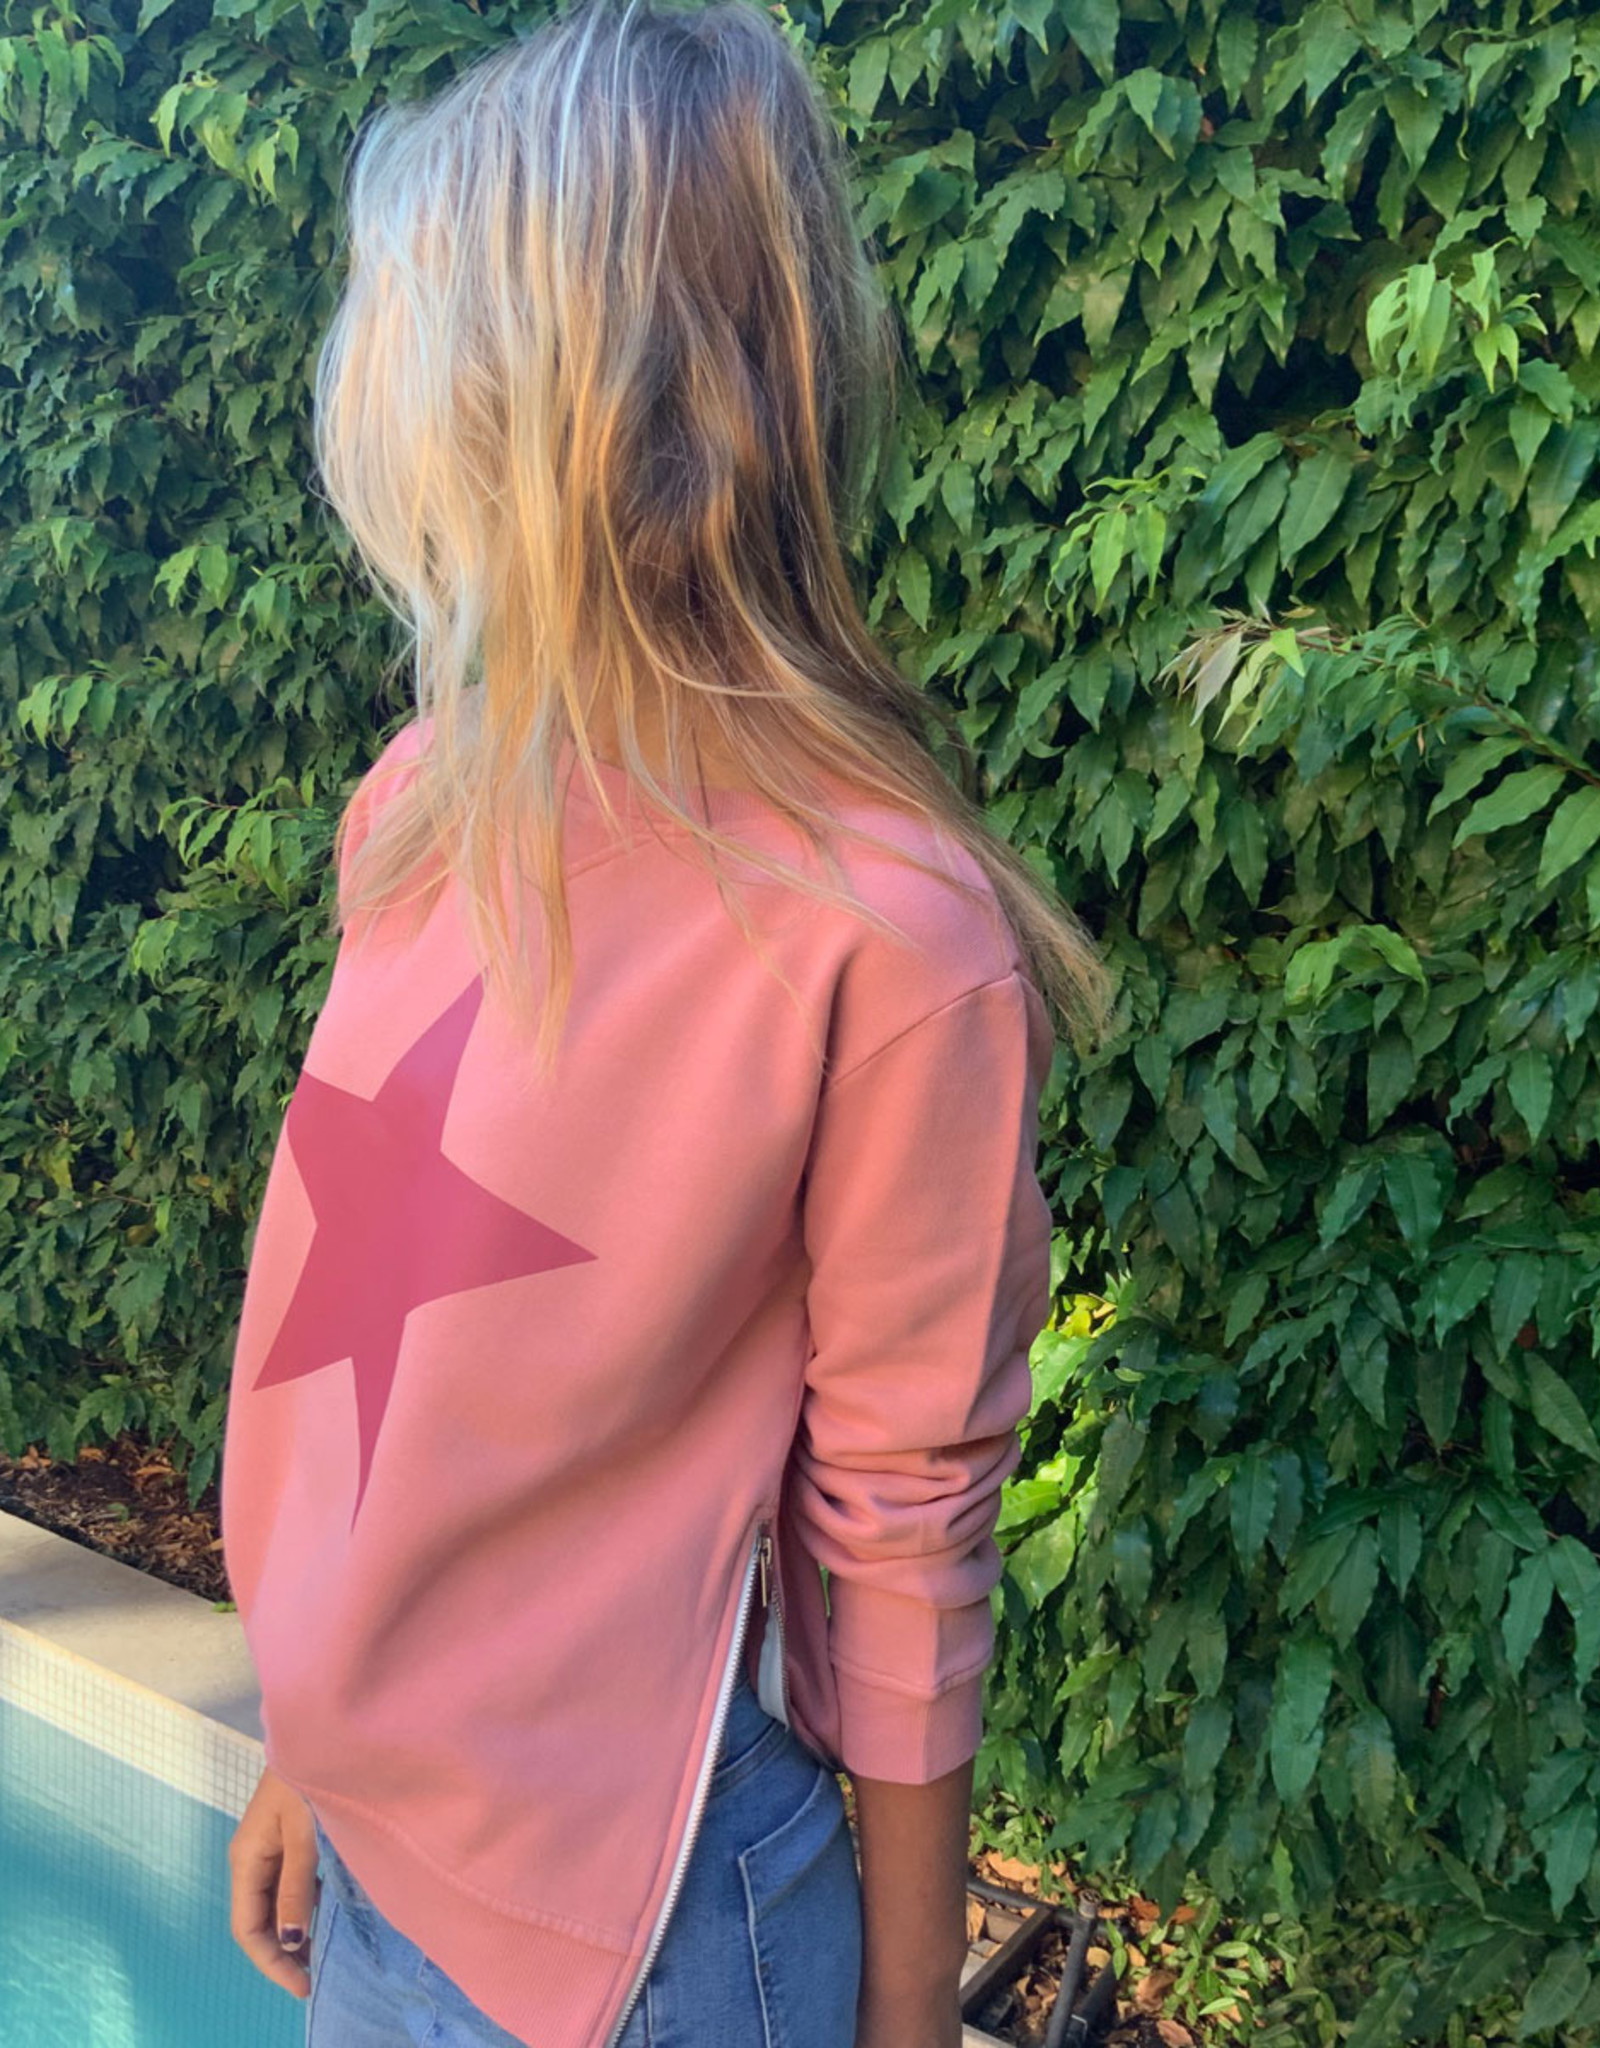 SOPHIE MORAN ZIP STAR SWEATSHIRT PLUM & PLUM STAR